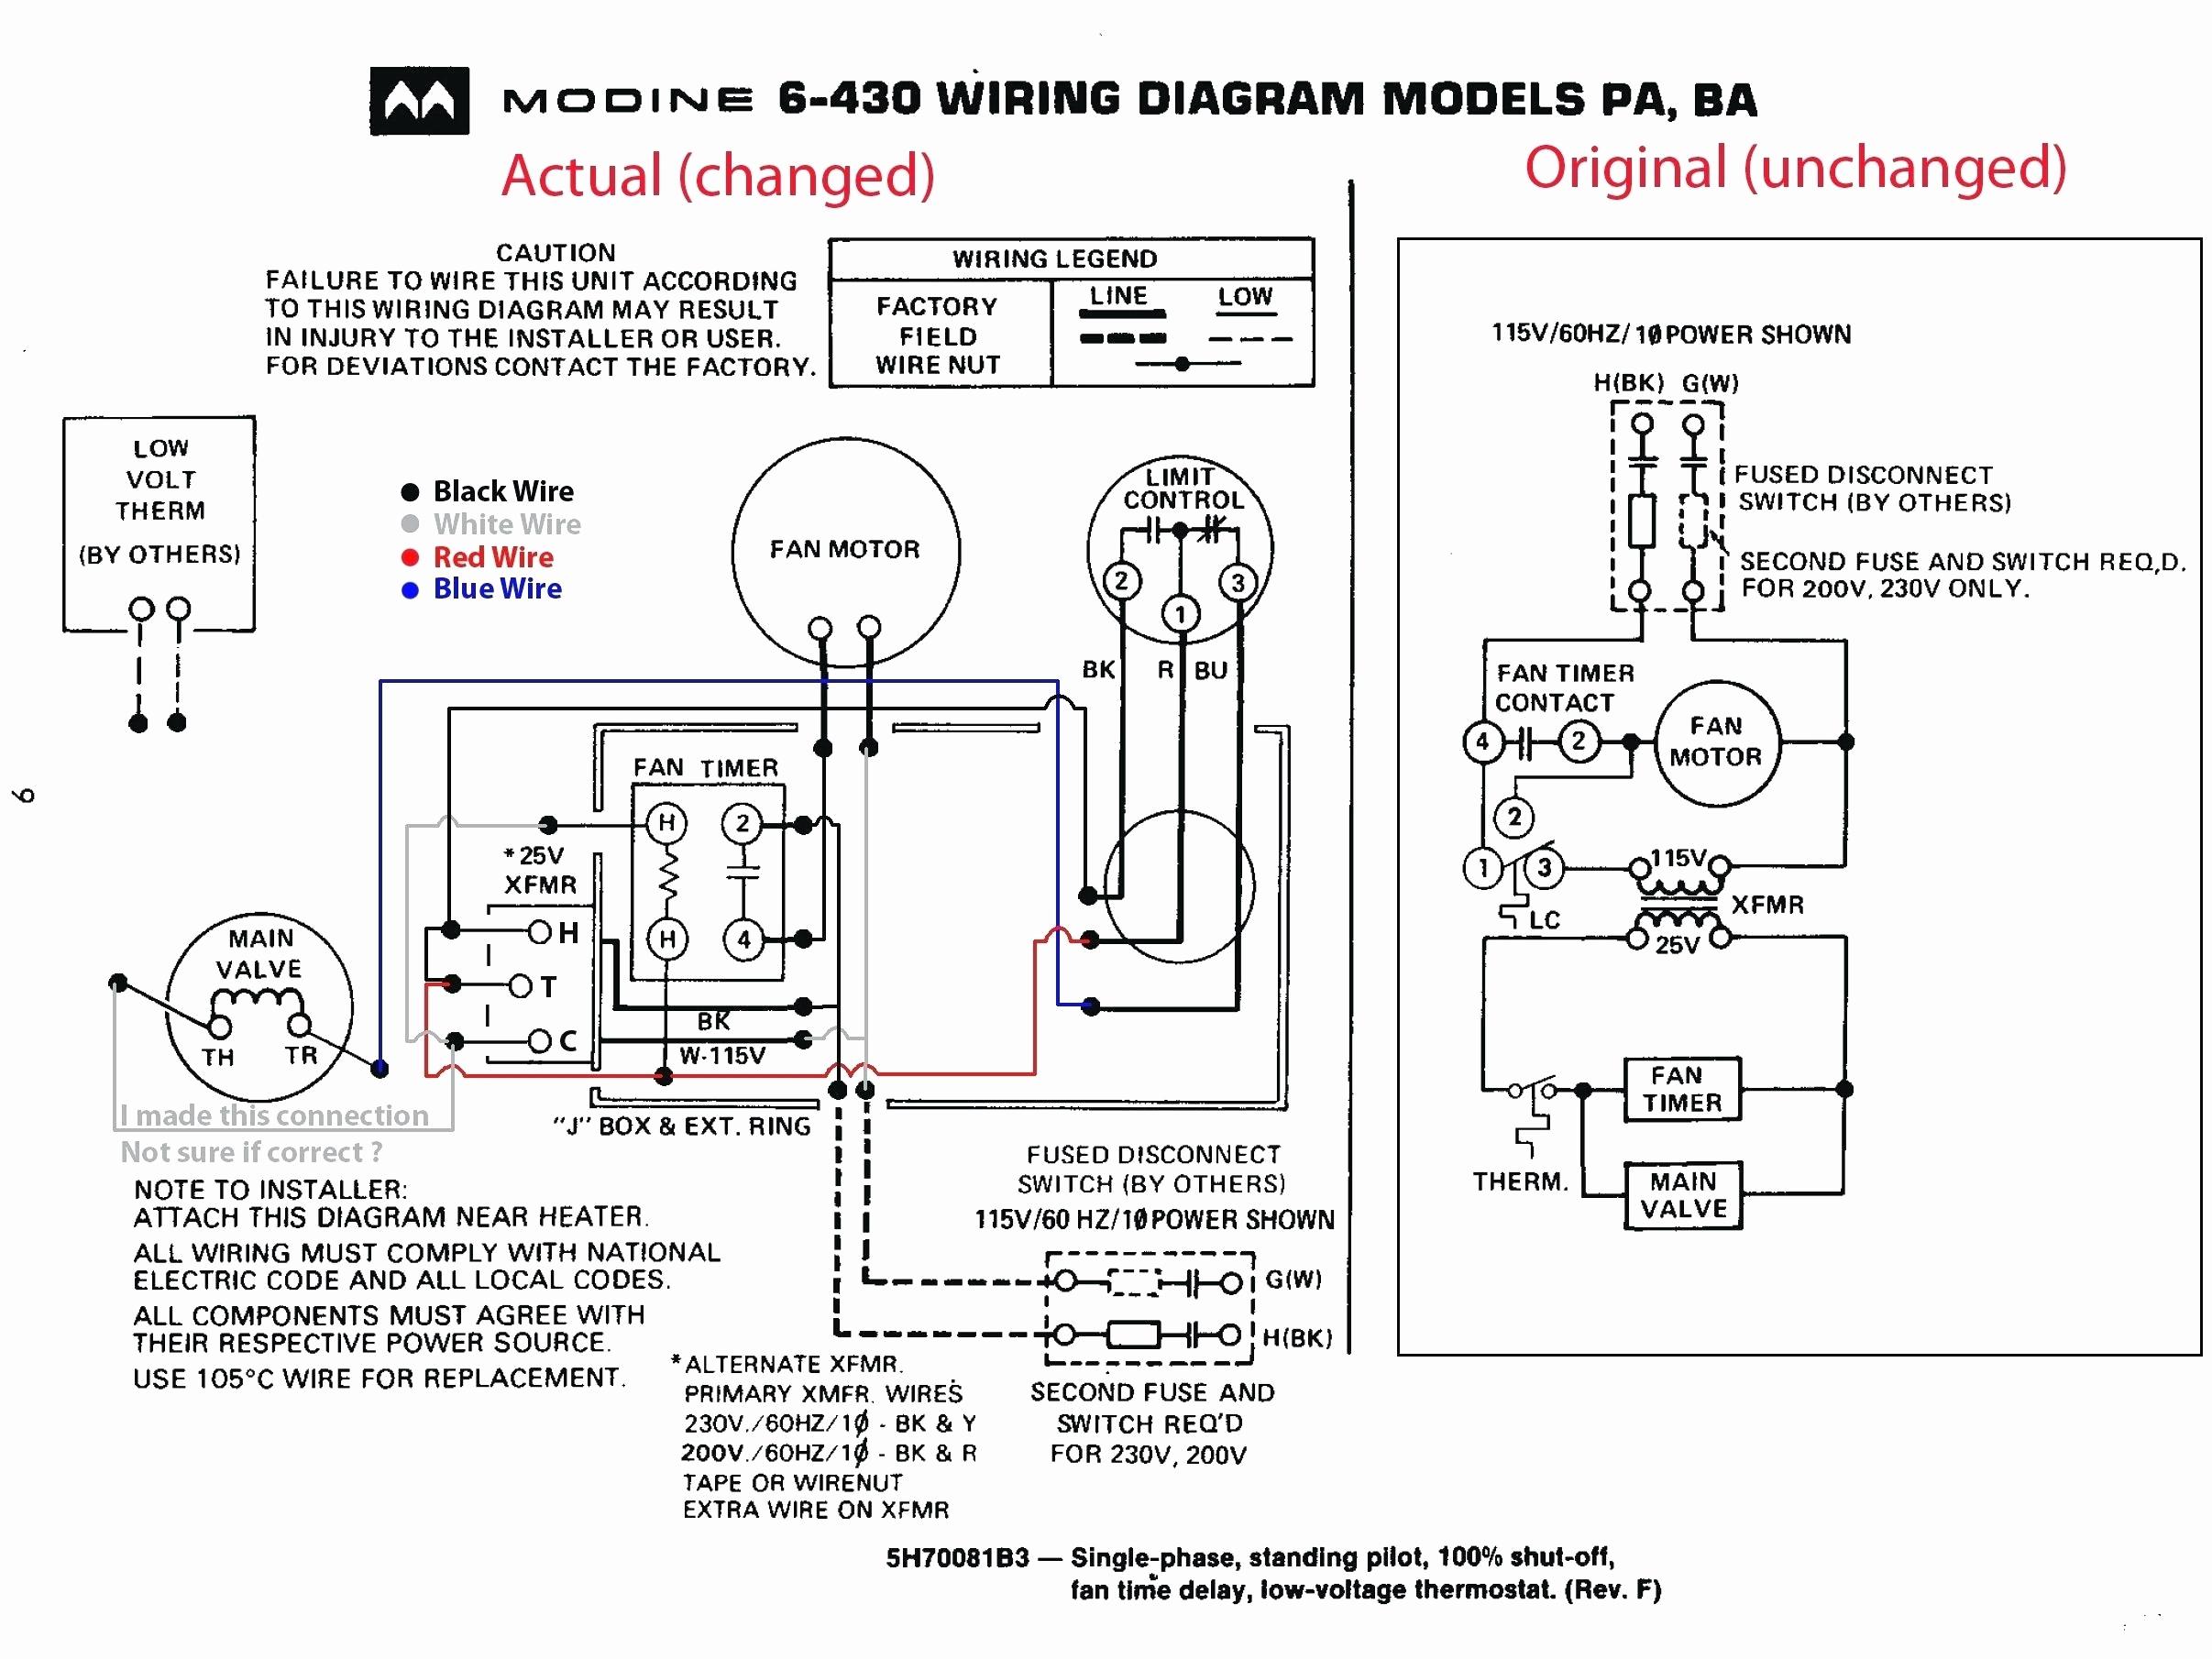 Pentair Booster Pump Wiring Diagram Free Download Wiring Diagram - Pentair Pool Pump Wiring Diagram